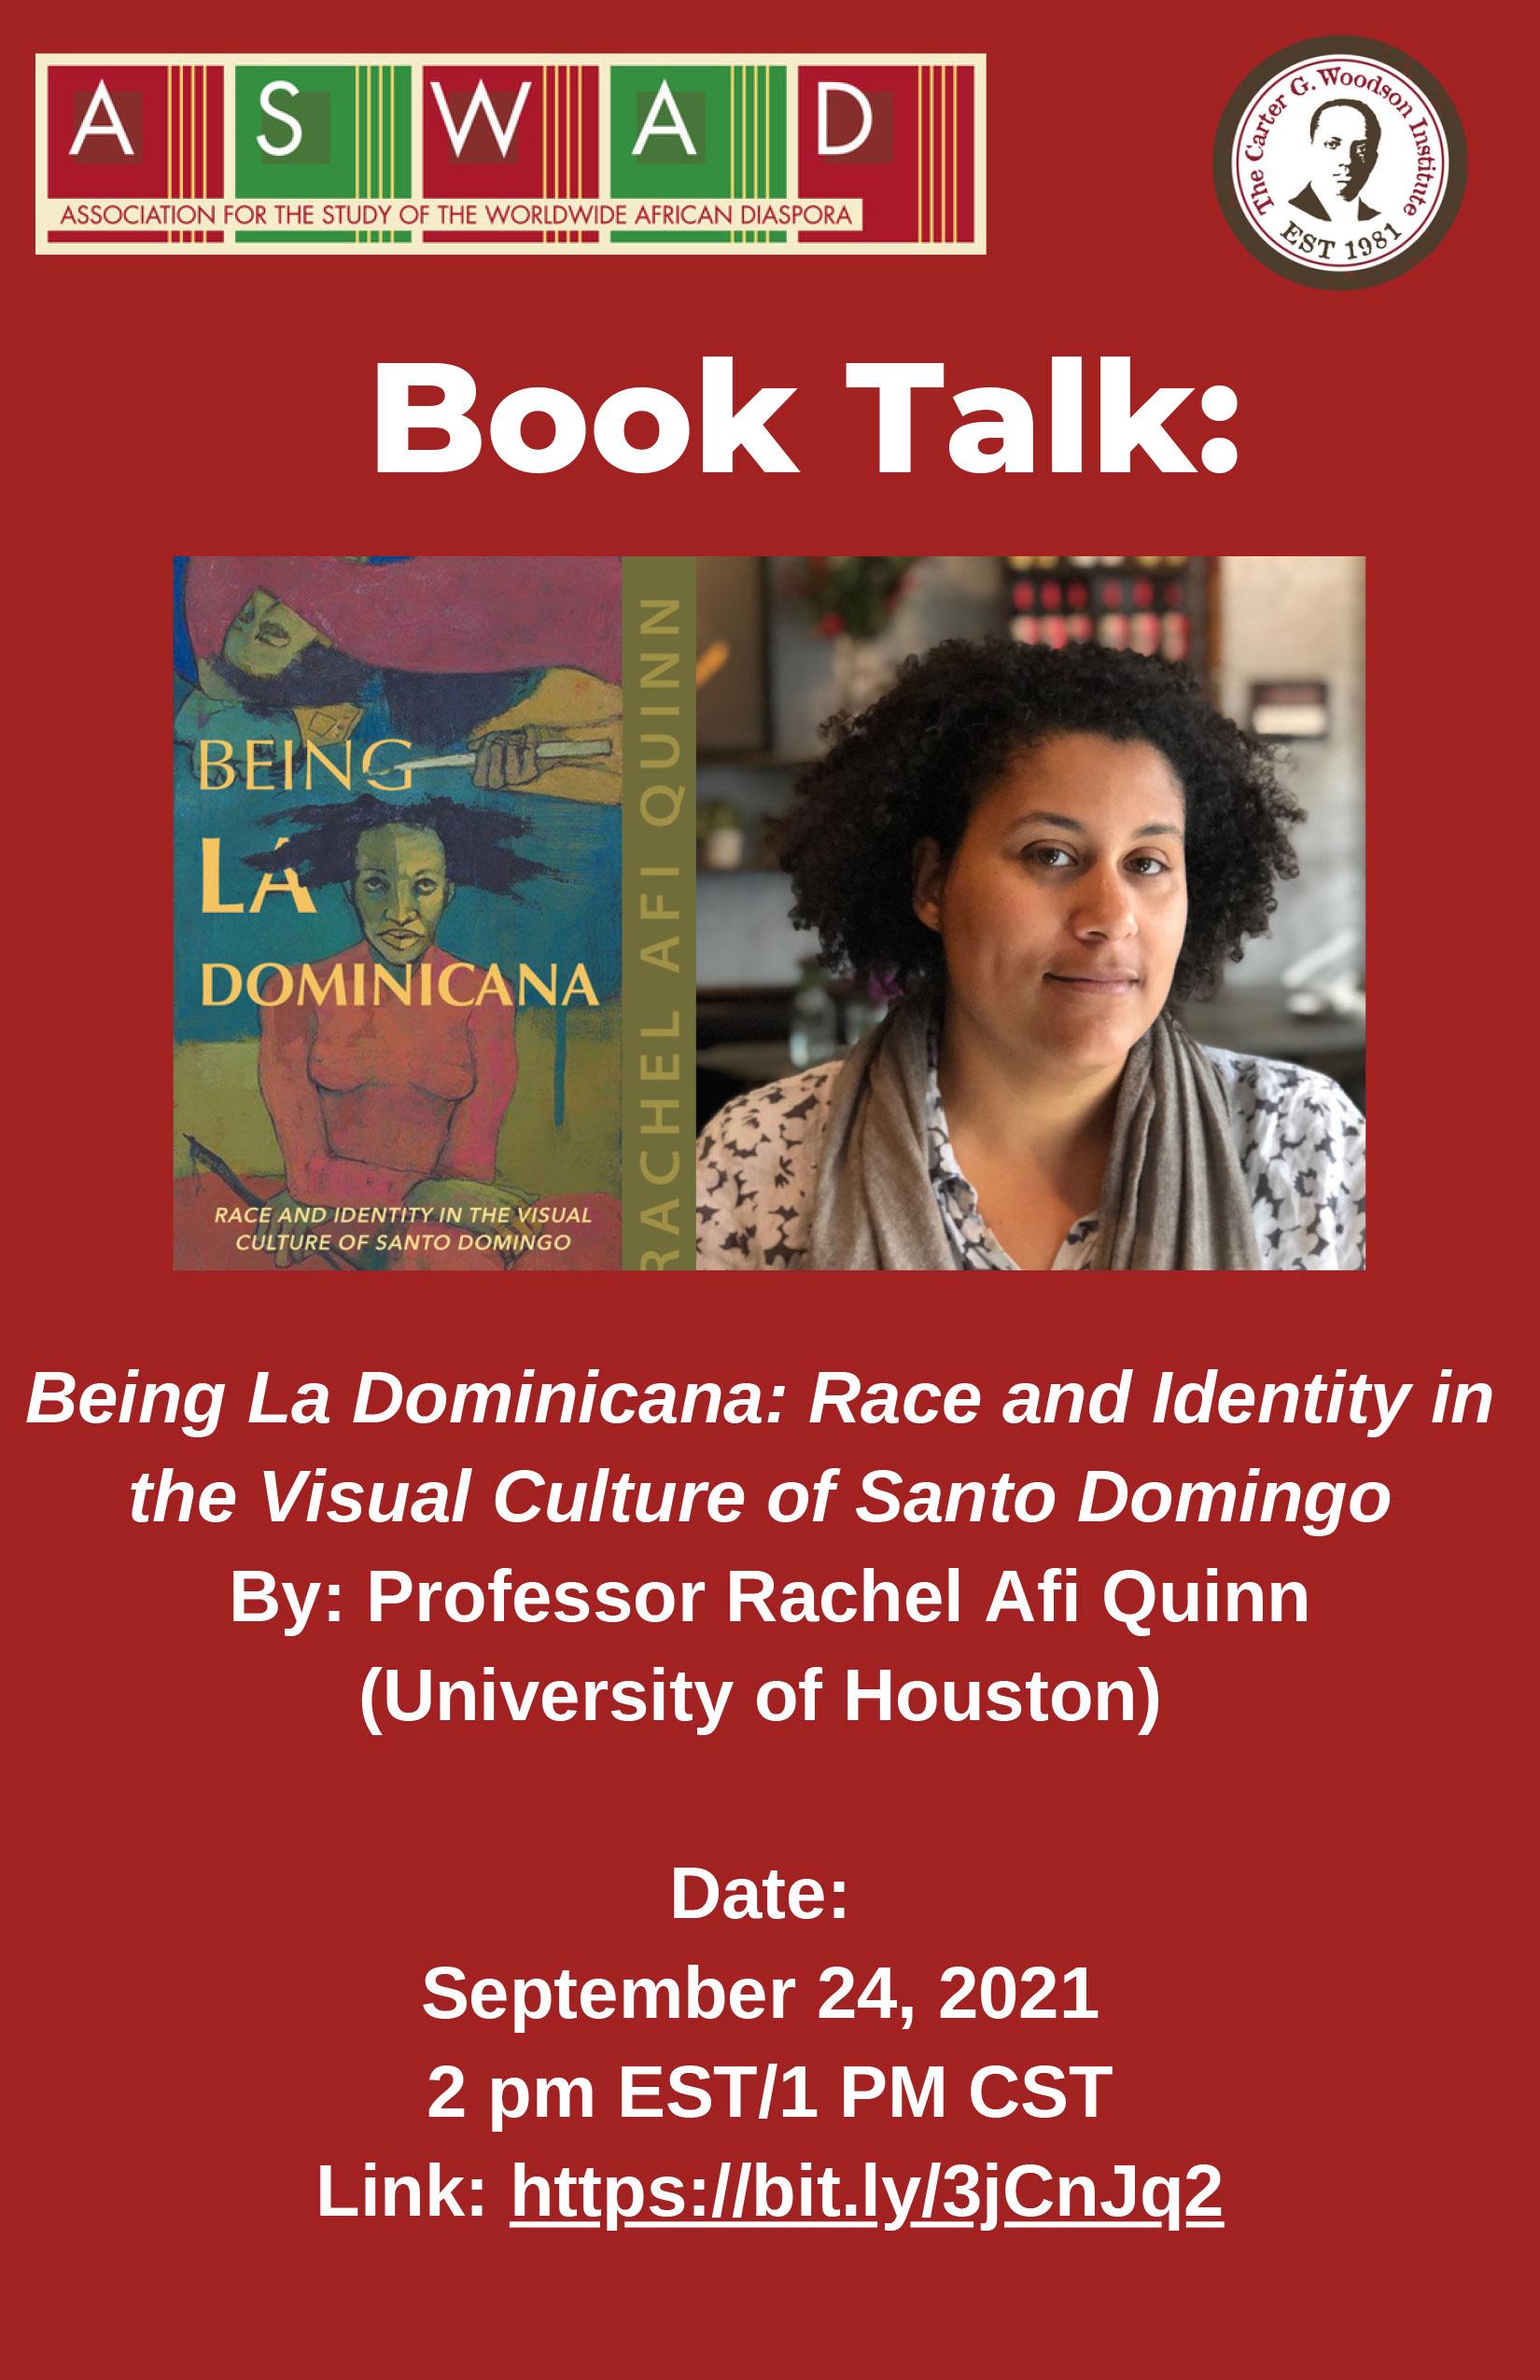 Book Talk: Being La Dominicana: Race and Identity in the Visual Culture of Santo Domingo